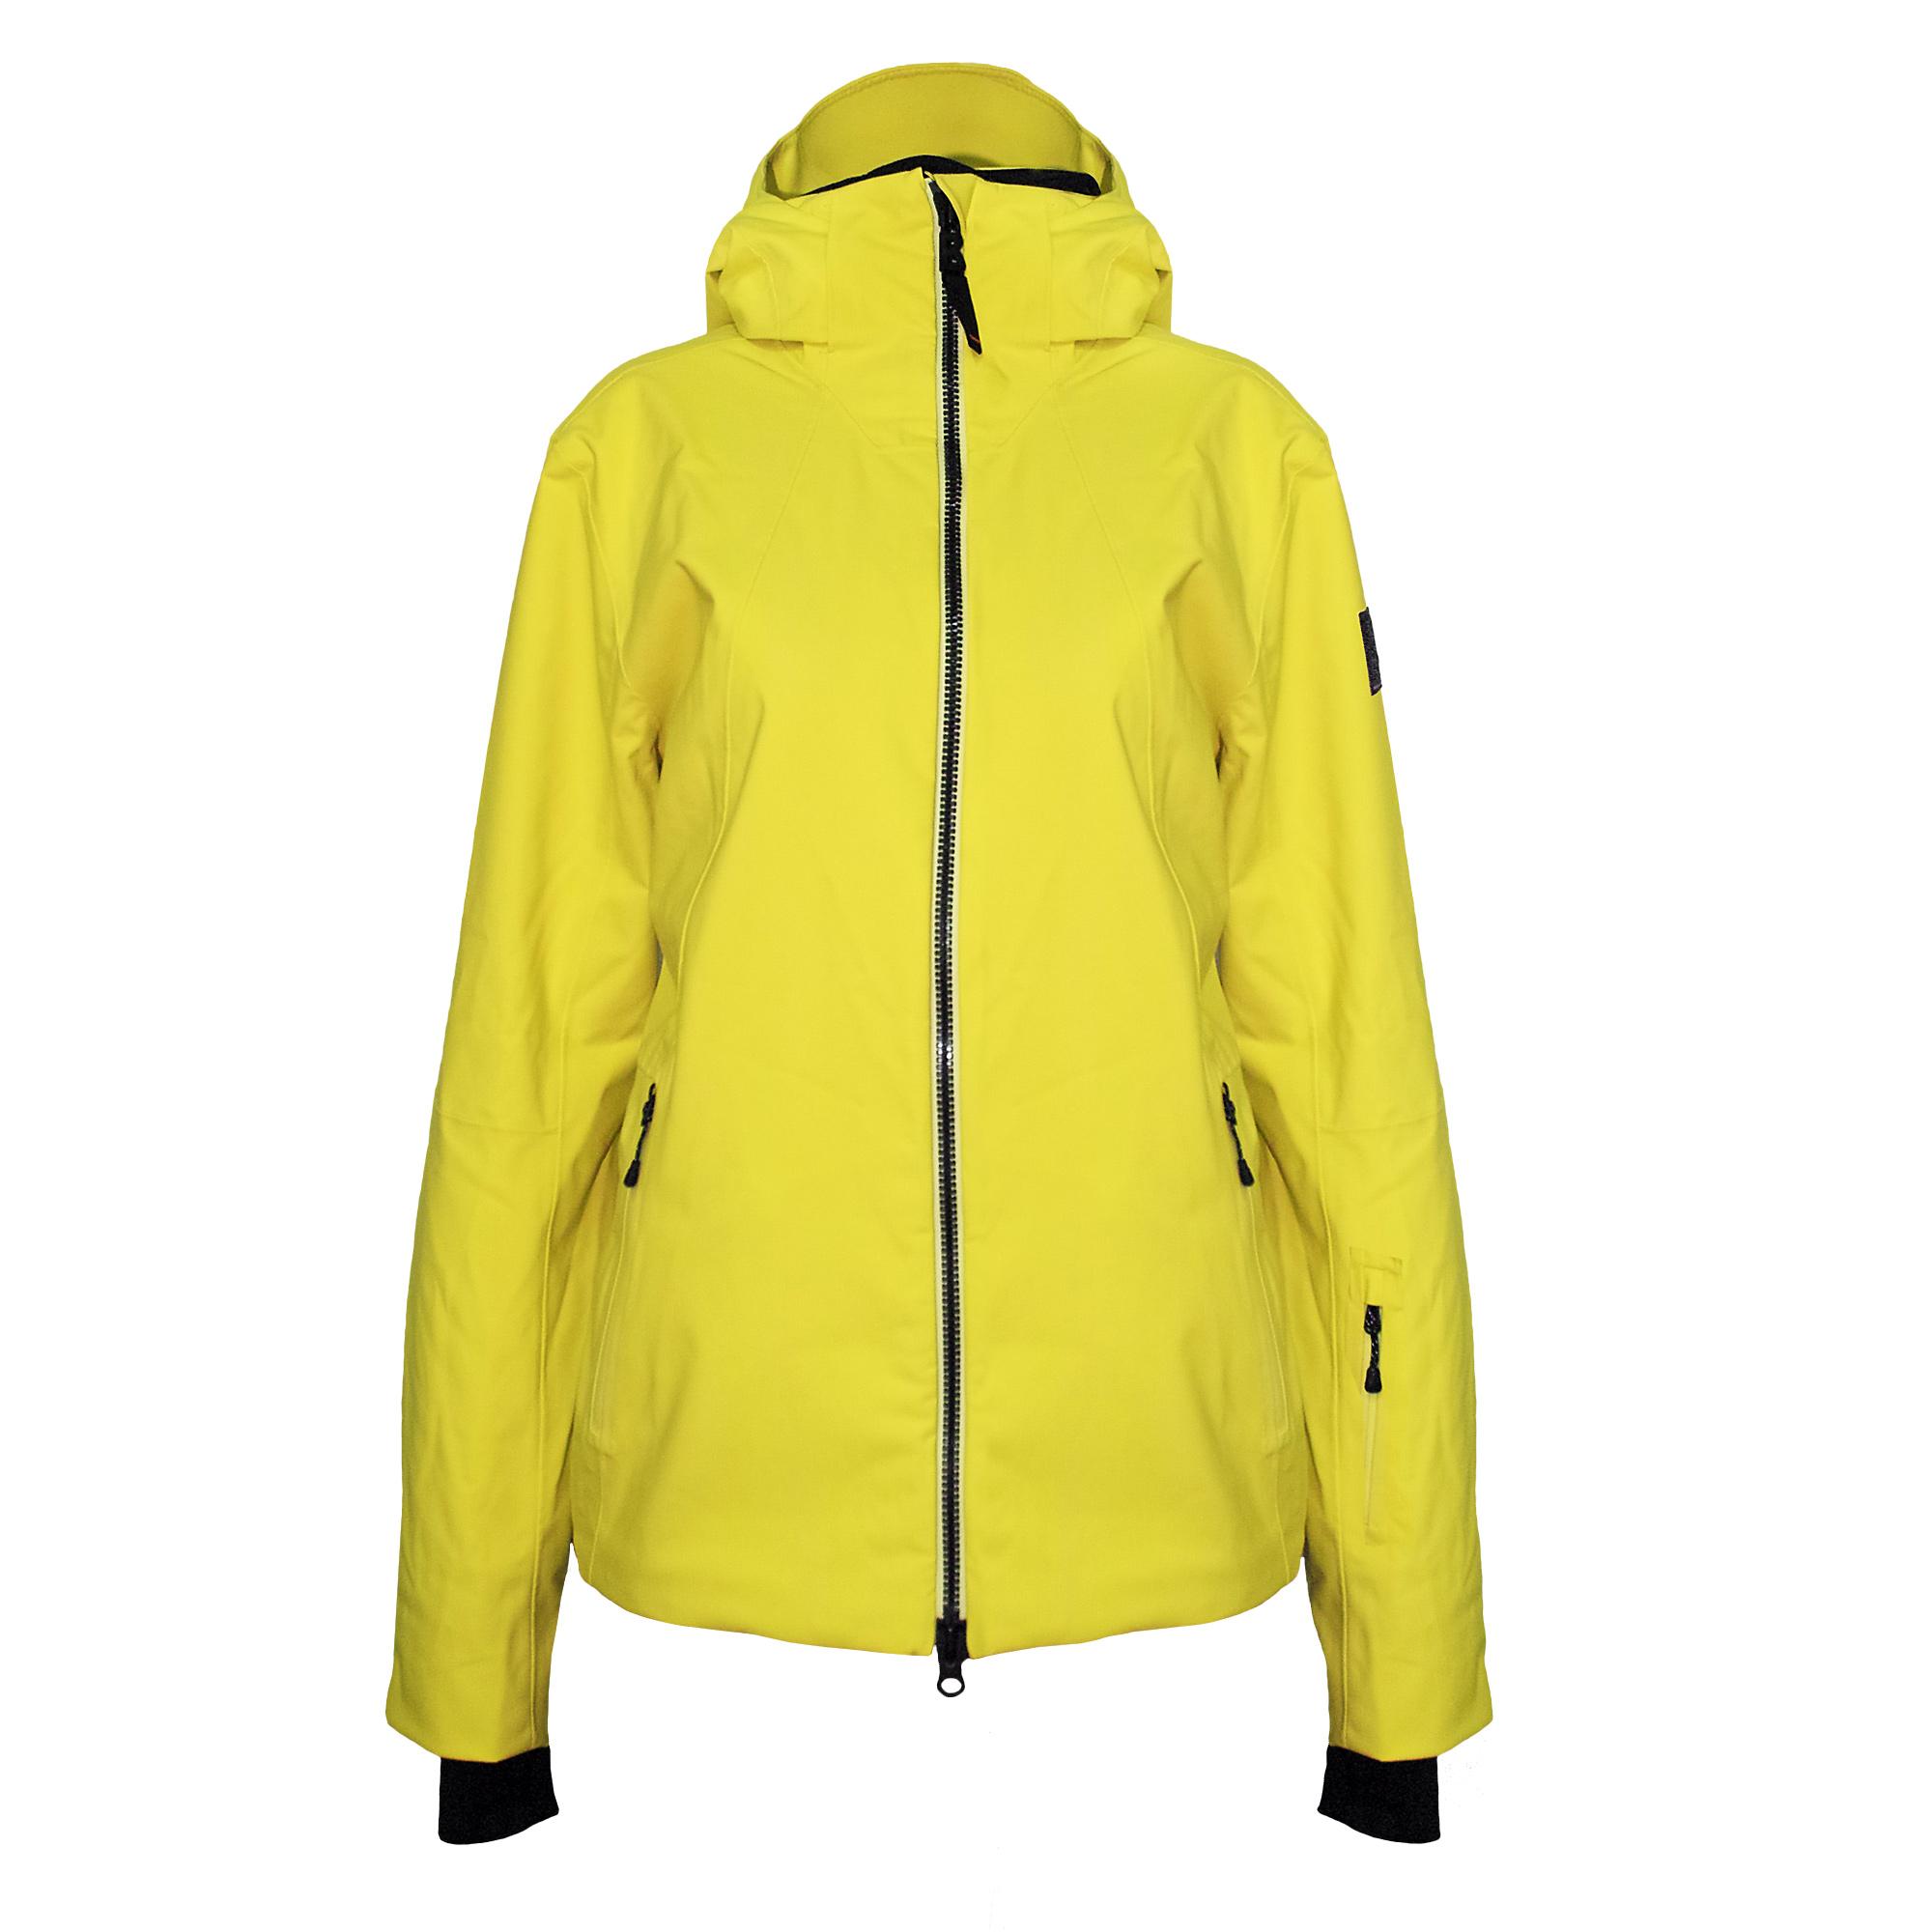 size 40 6c705 b0e97 Bogner Fire + Ice Charlene 18/19 - Damen Skijacke Snowboard Jacke - 3484  4901-045 gelb